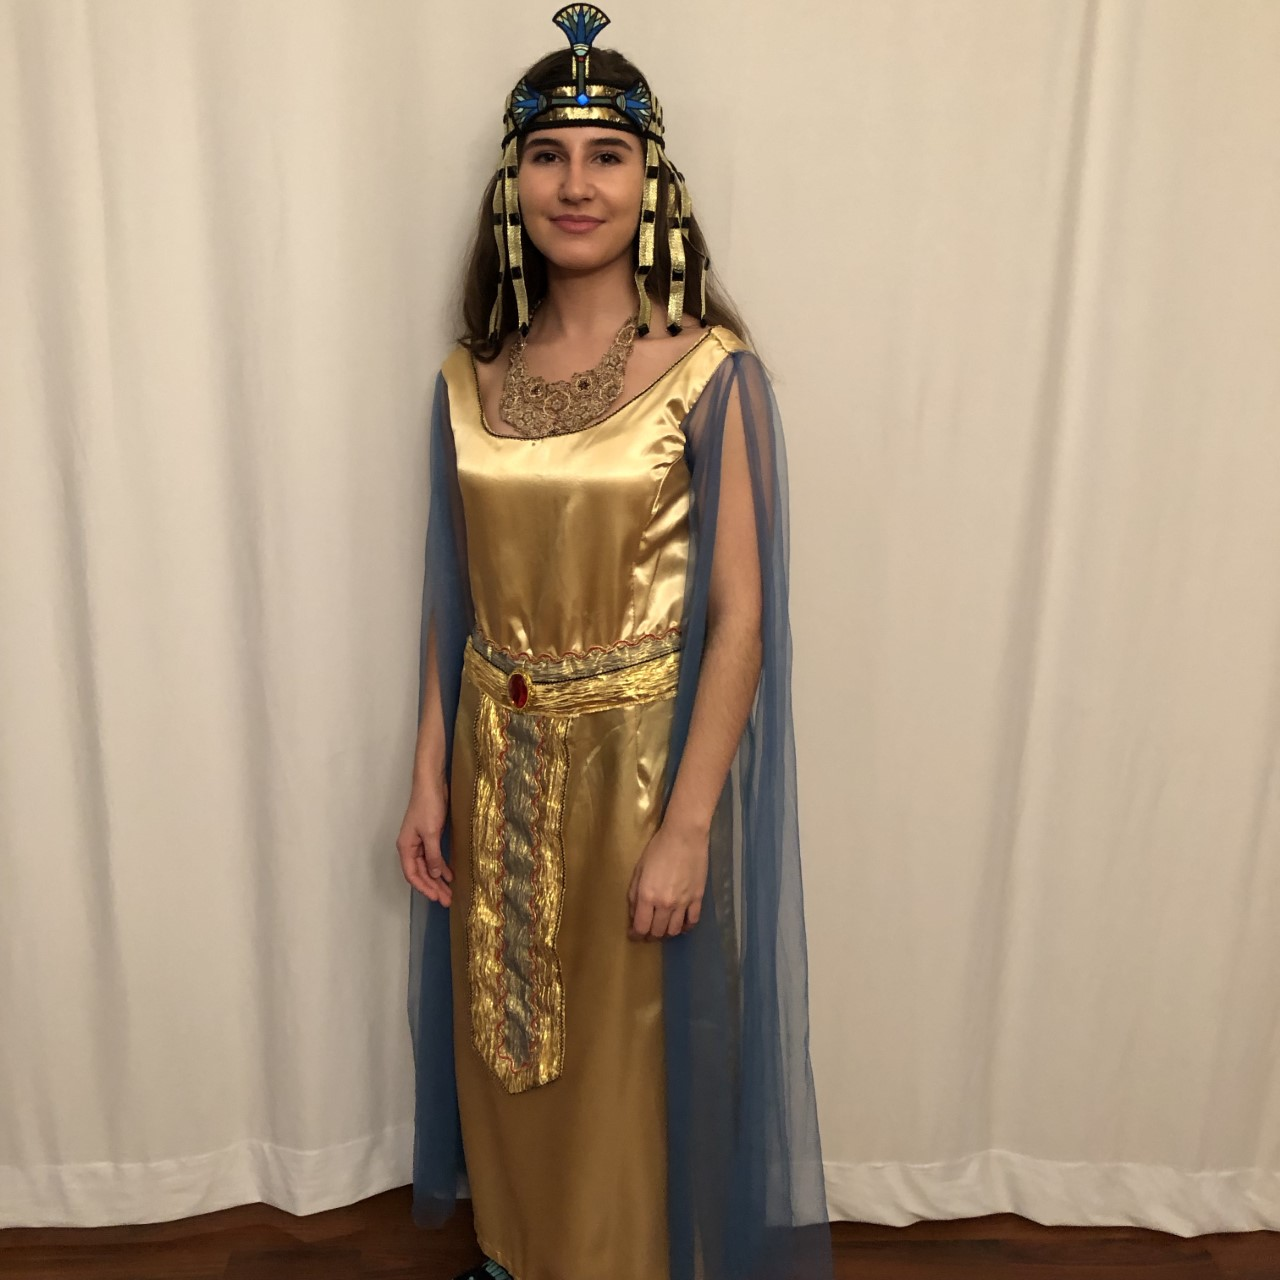 Jacqueline Kaskel as The Egyptian Princess Batya Jacqueline Kaskel as The Egyptian Princess Batya